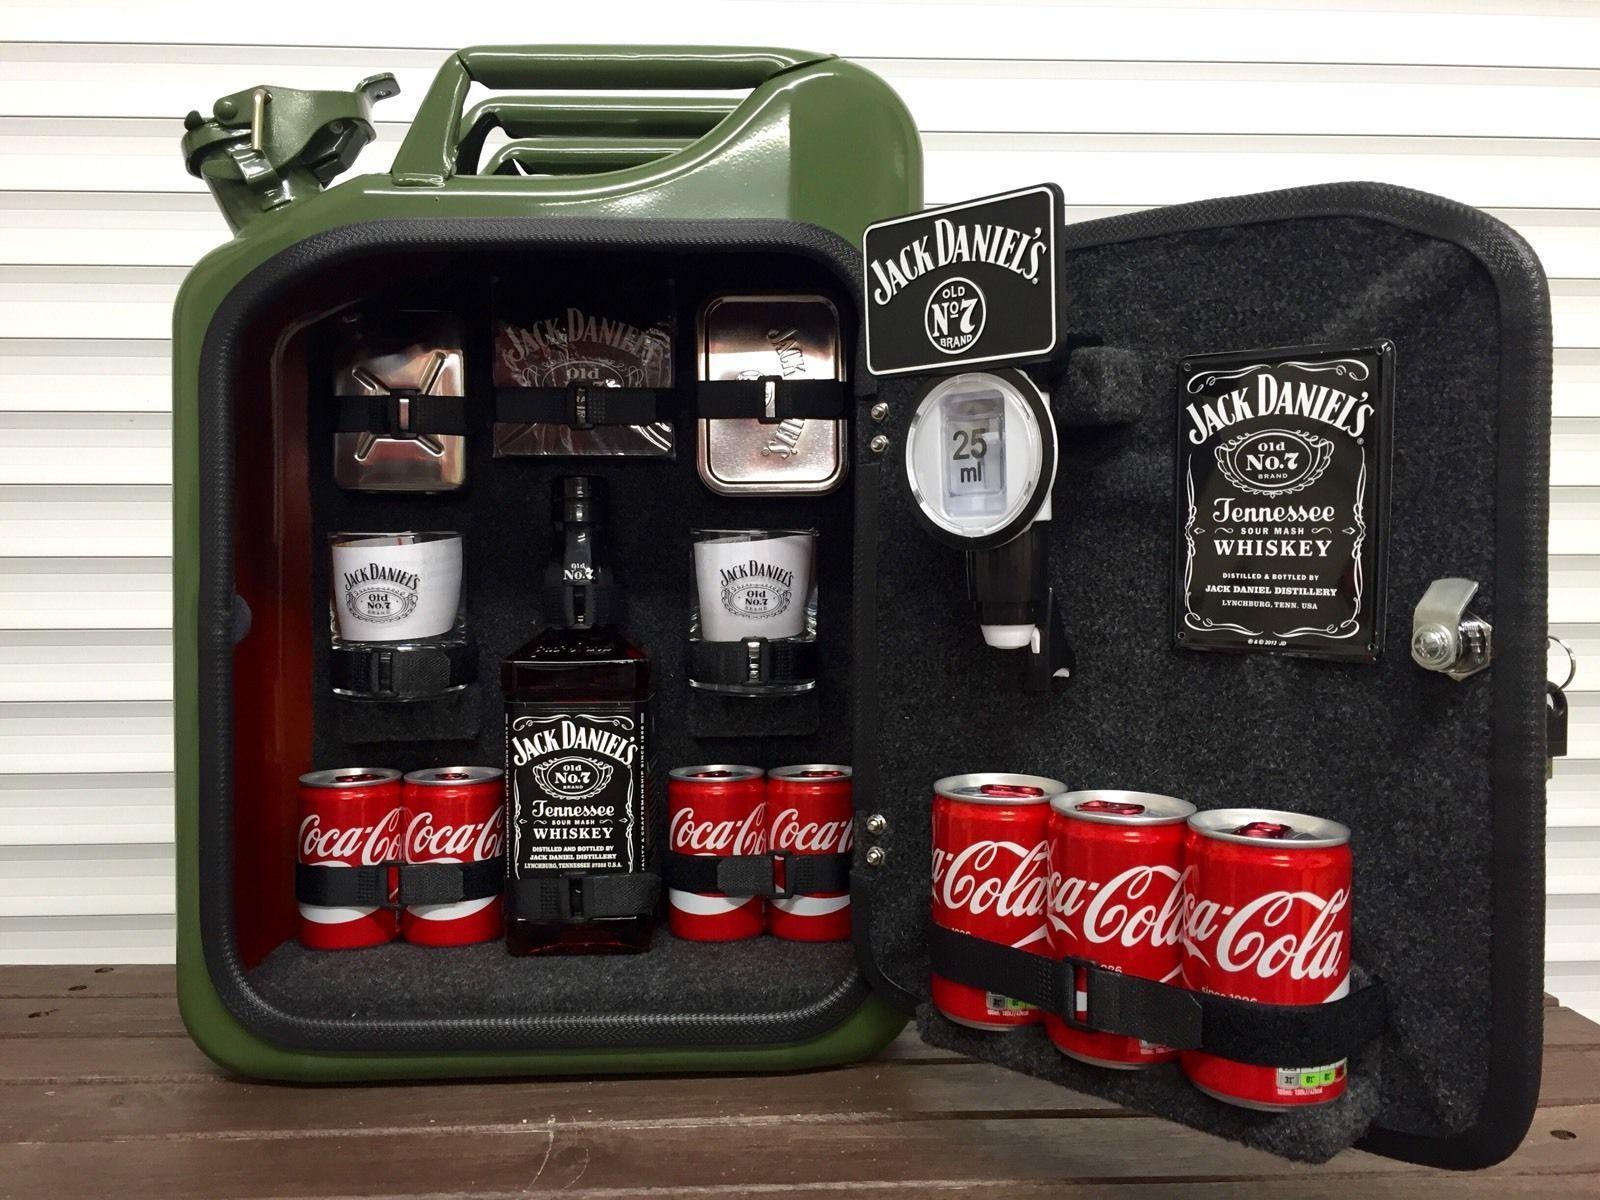 Jerry Can Mini Bar Jack Daniels Grey Goose Vodka Whiskey Camping Glamping Gift Jack Daniels Geschenke Diy Ideen Diy Bastelideen